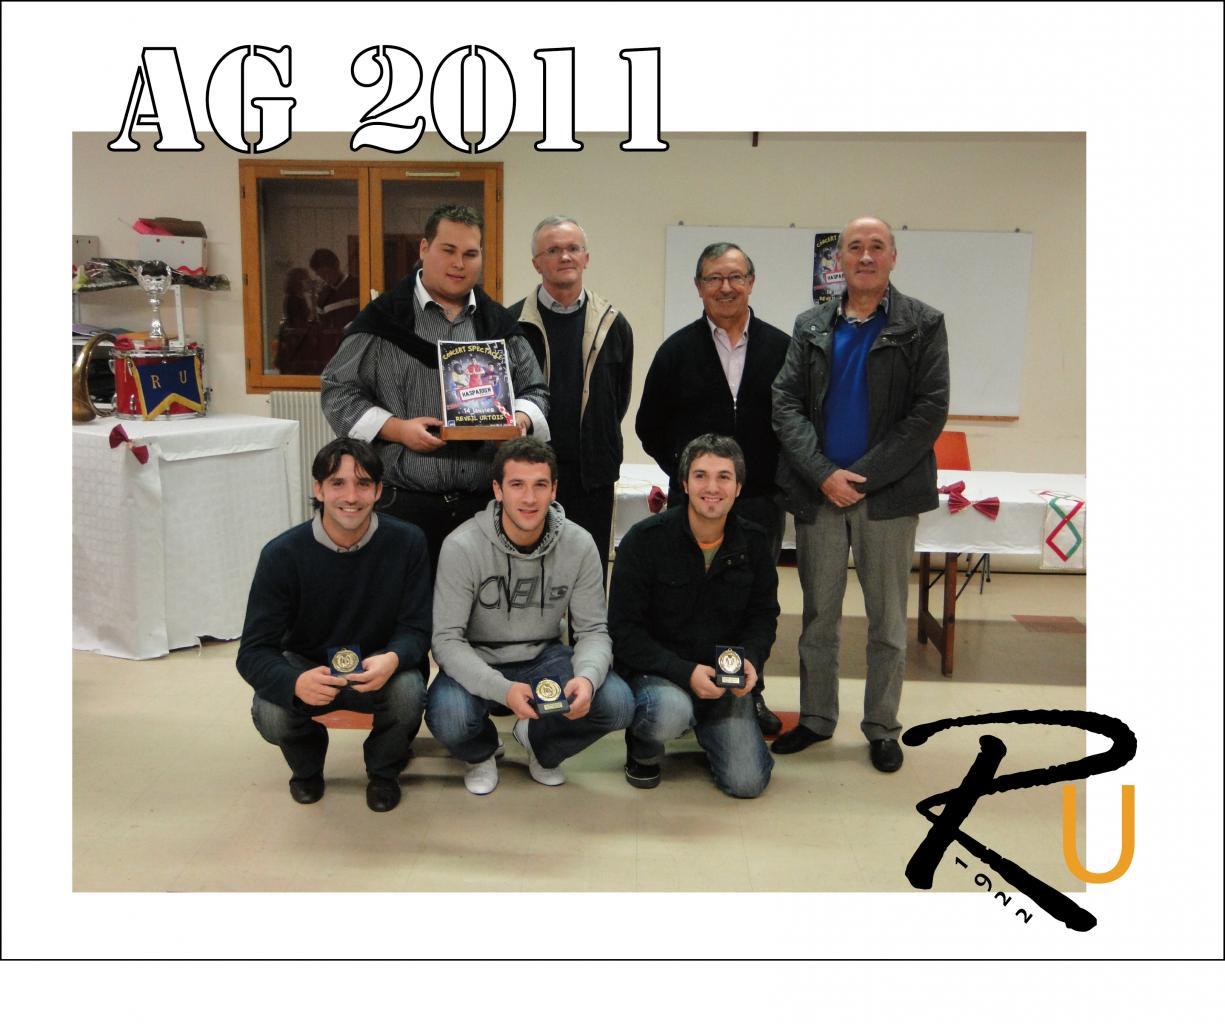 AG 2011